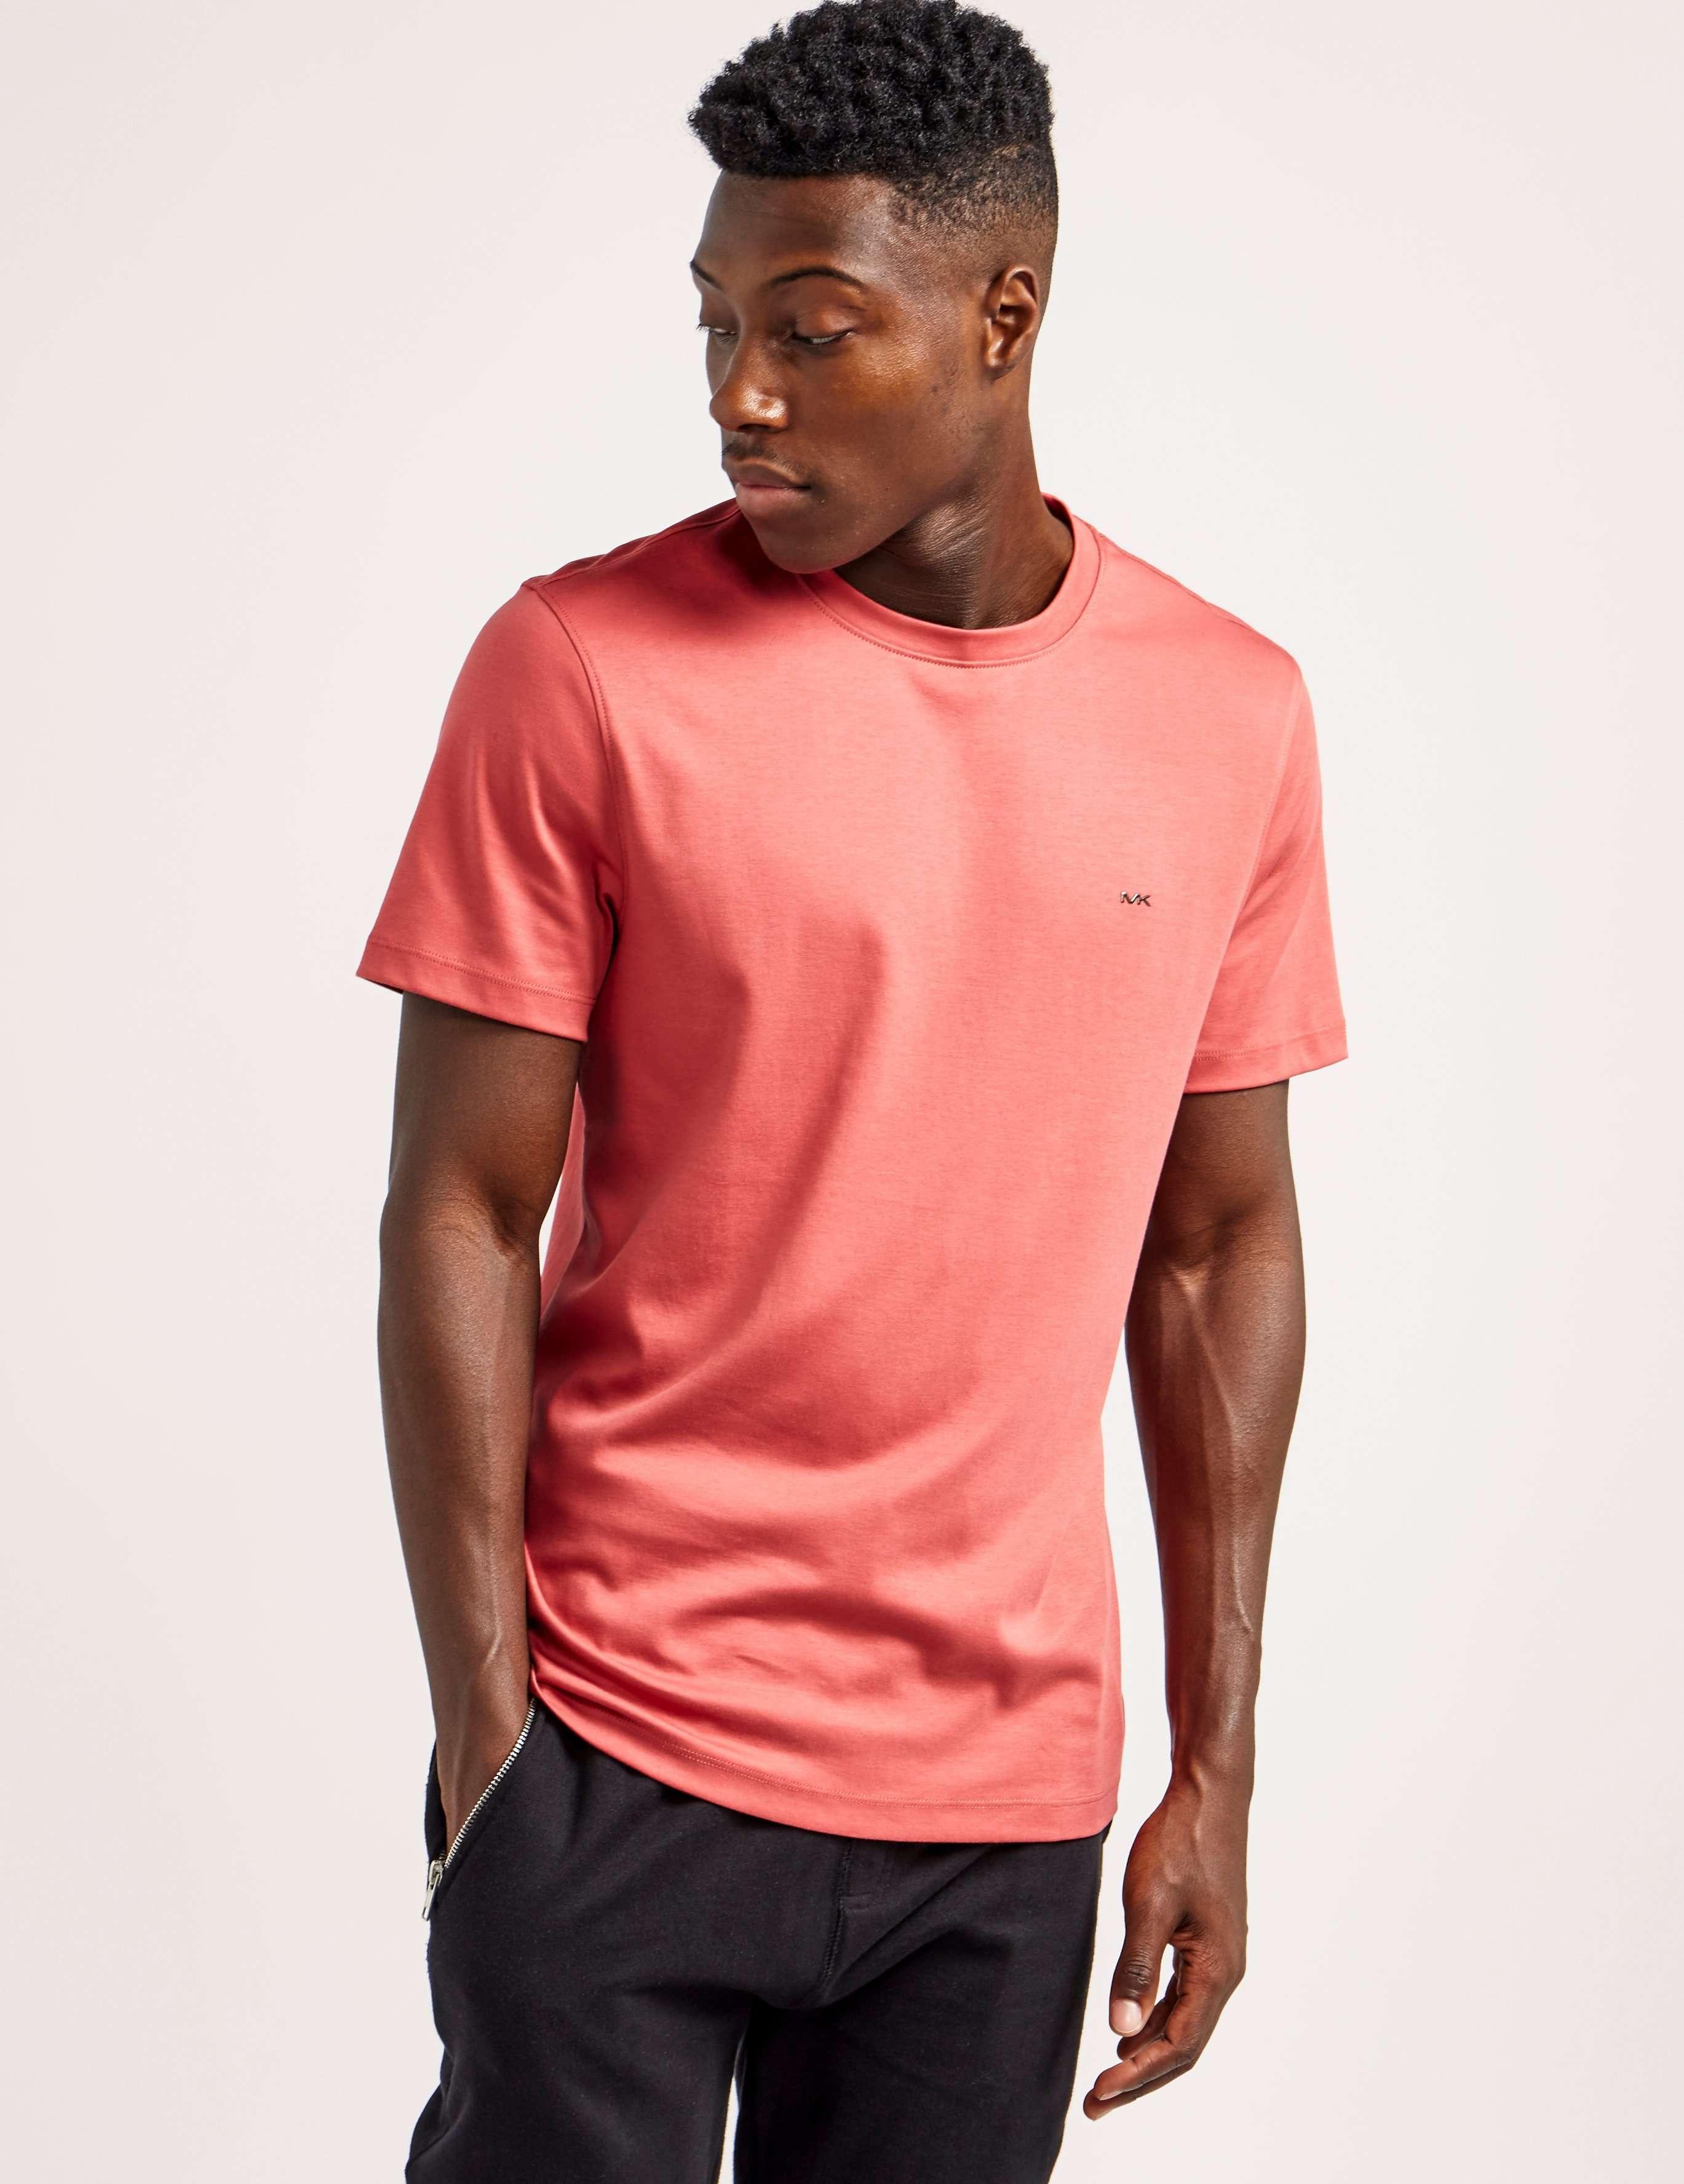 Michael Kors Short Sleeve Sleek T-Shirt